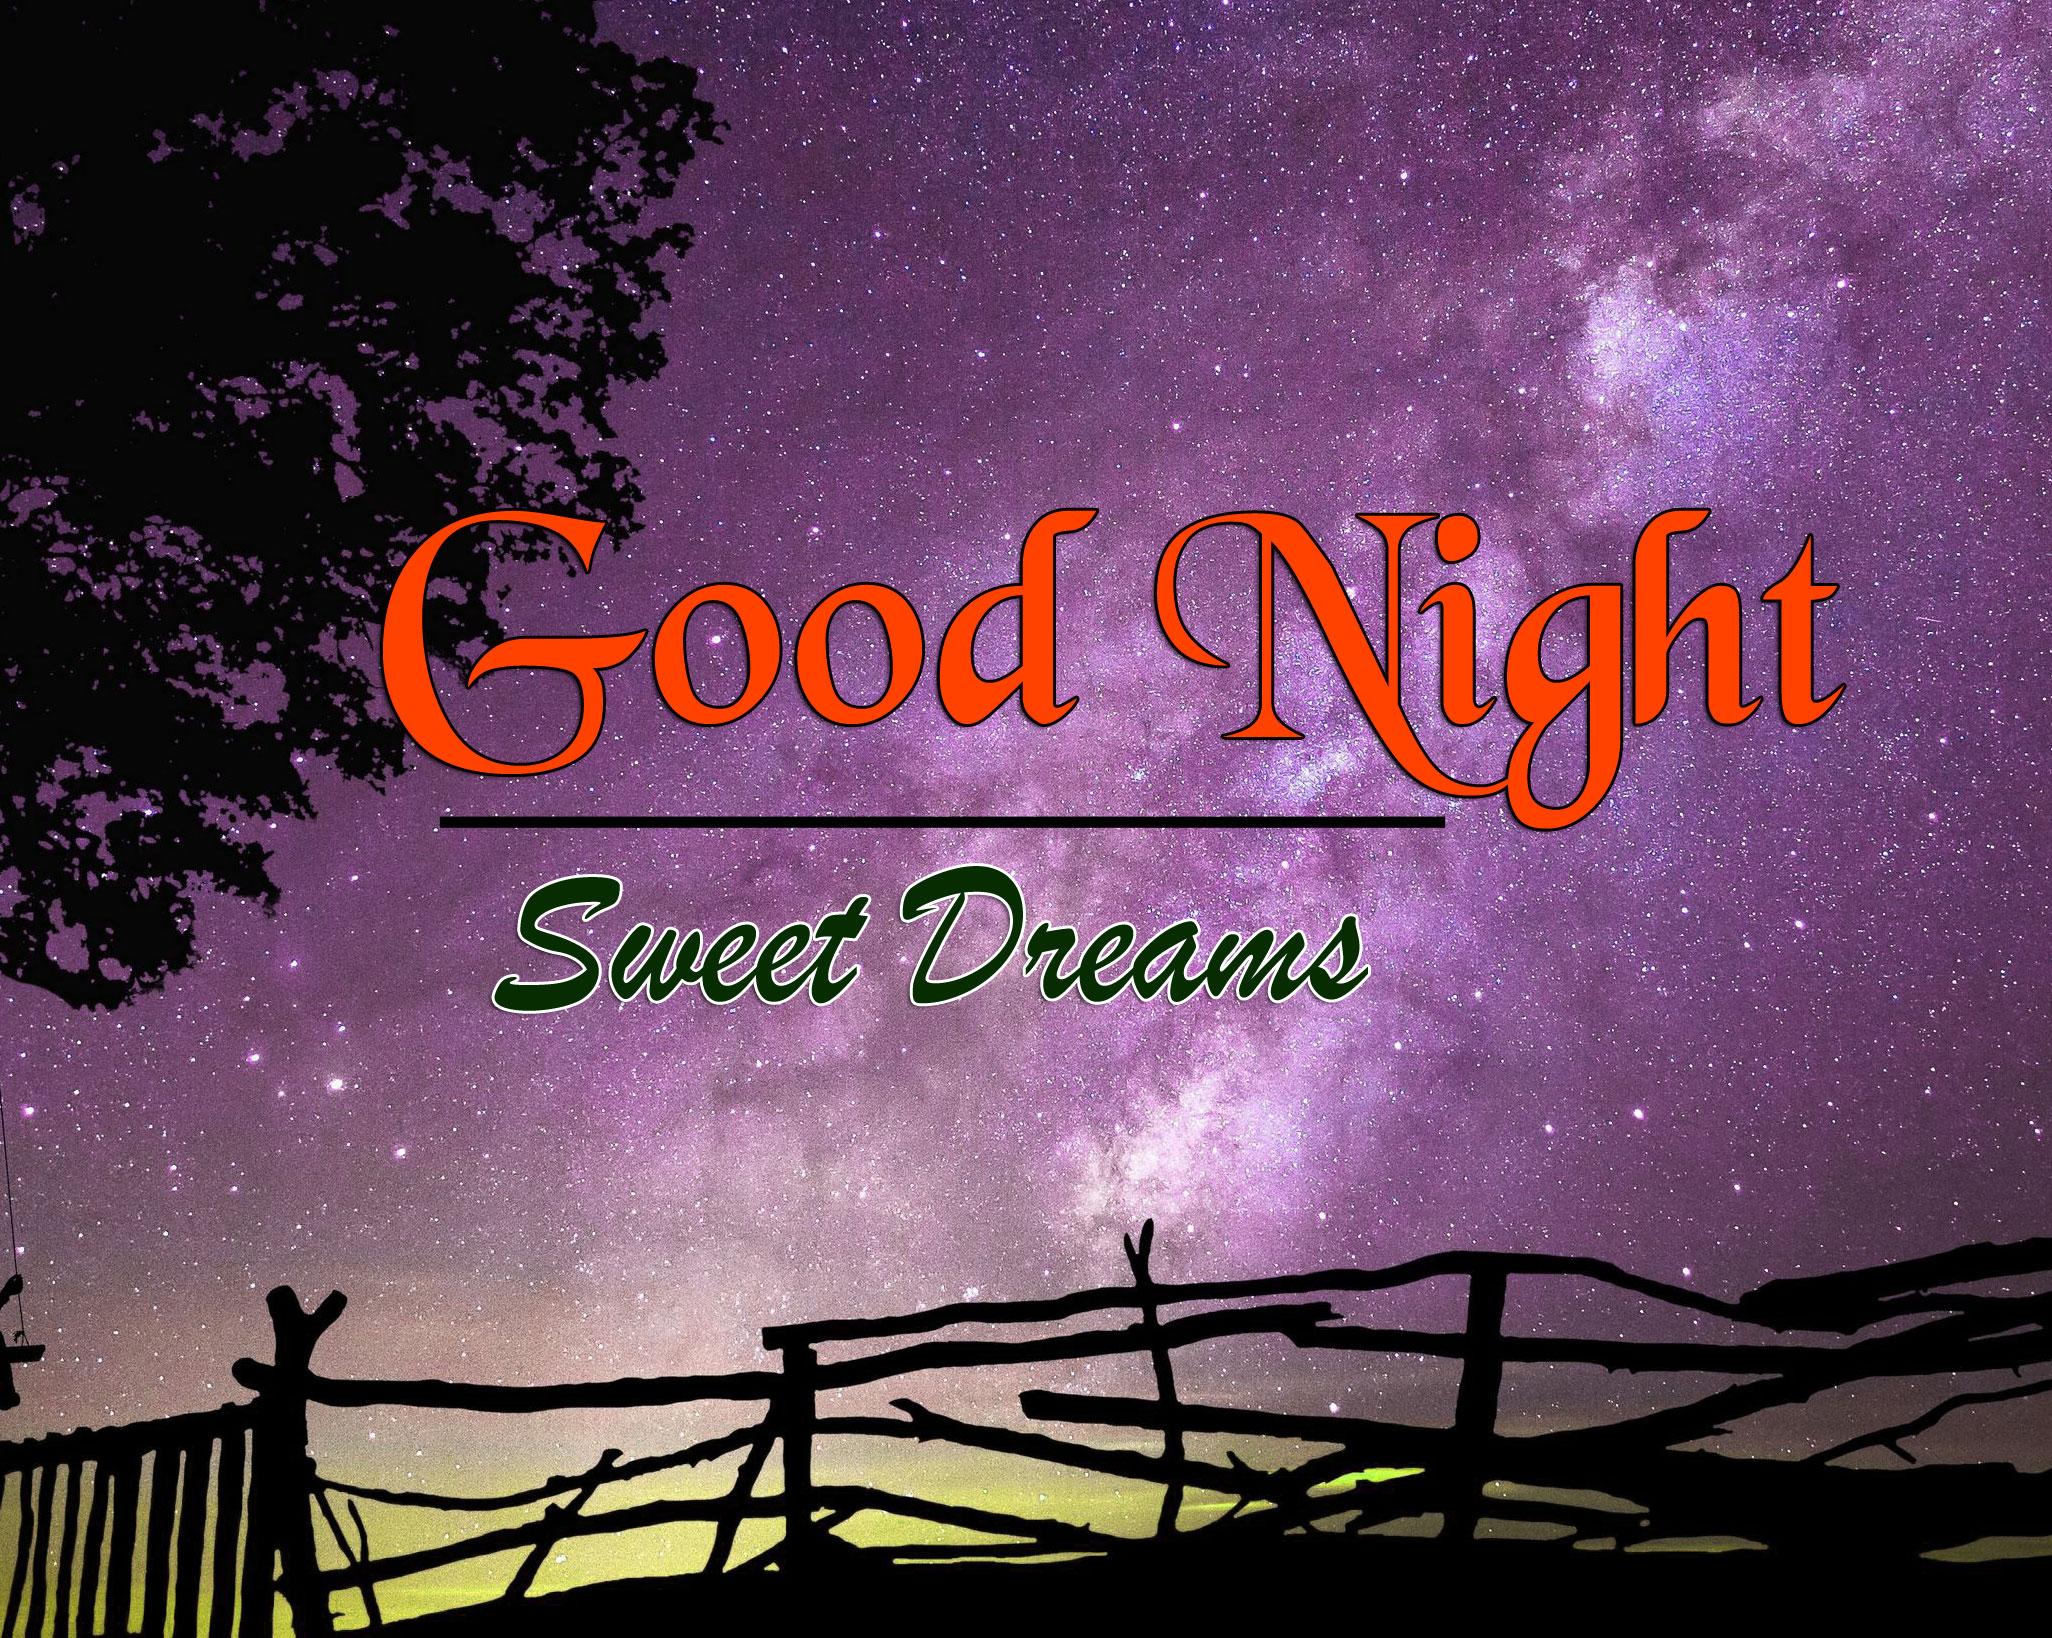 Friend Good Night Wishes Photo for Whatsapp